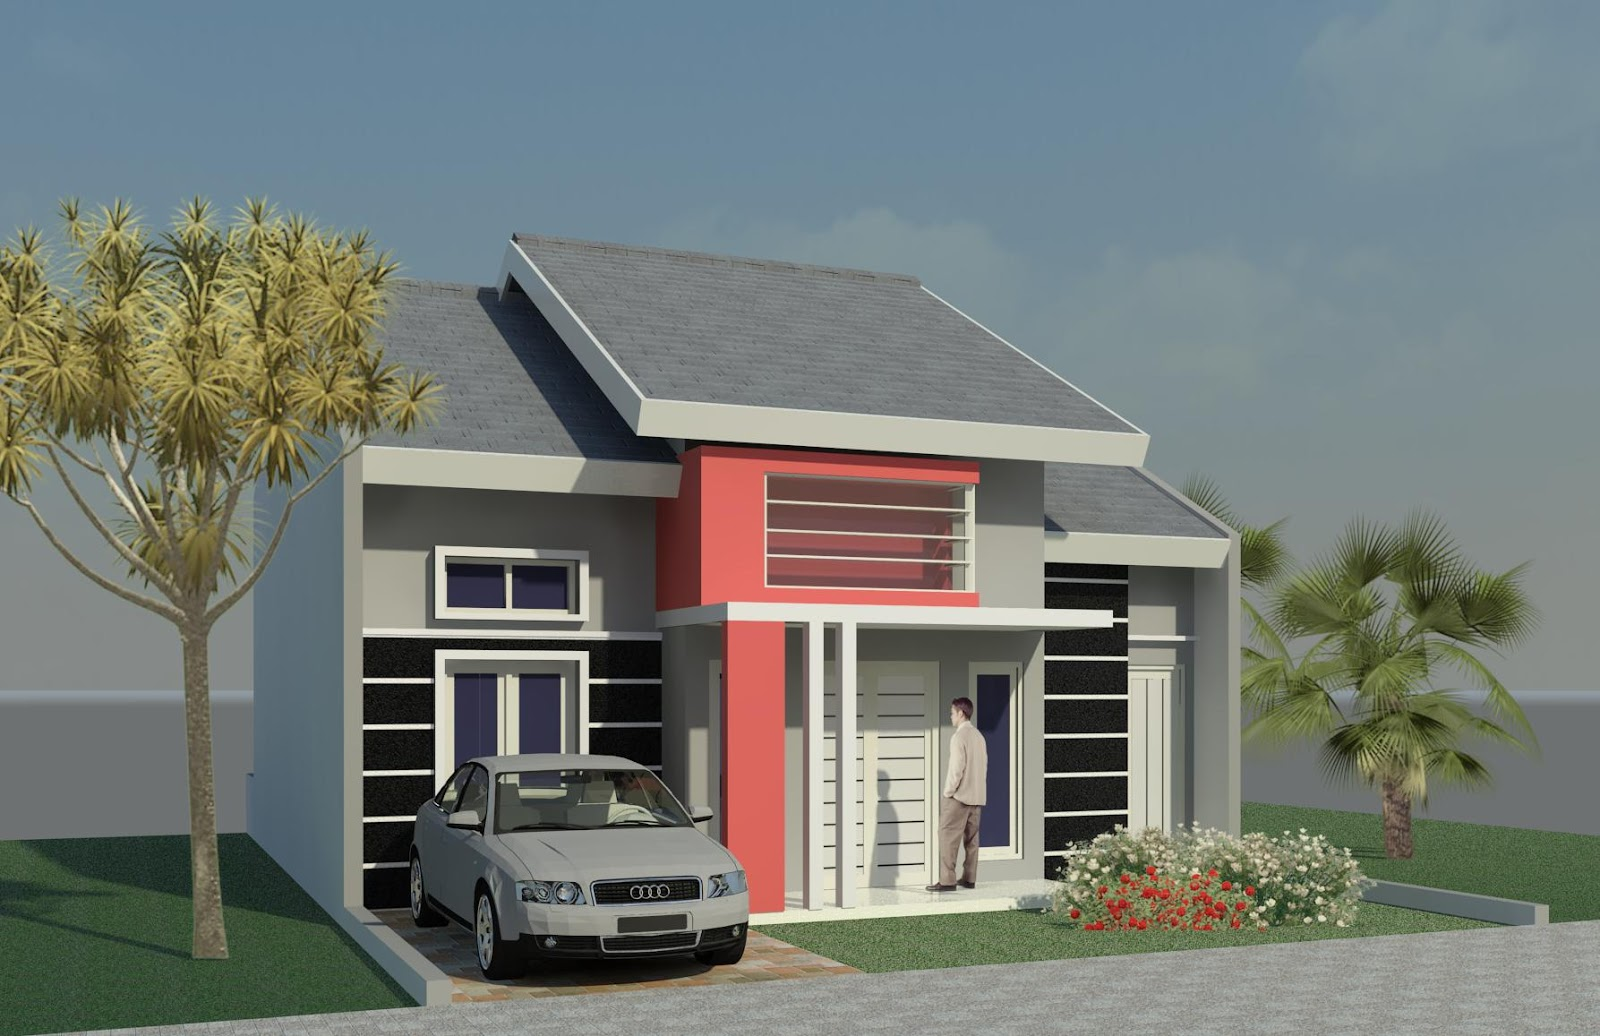 Gambar Rumah Minimalis Type 21 1 Lantai | Gambar Desain Rumah Minimalis Type 21 2 Lantai